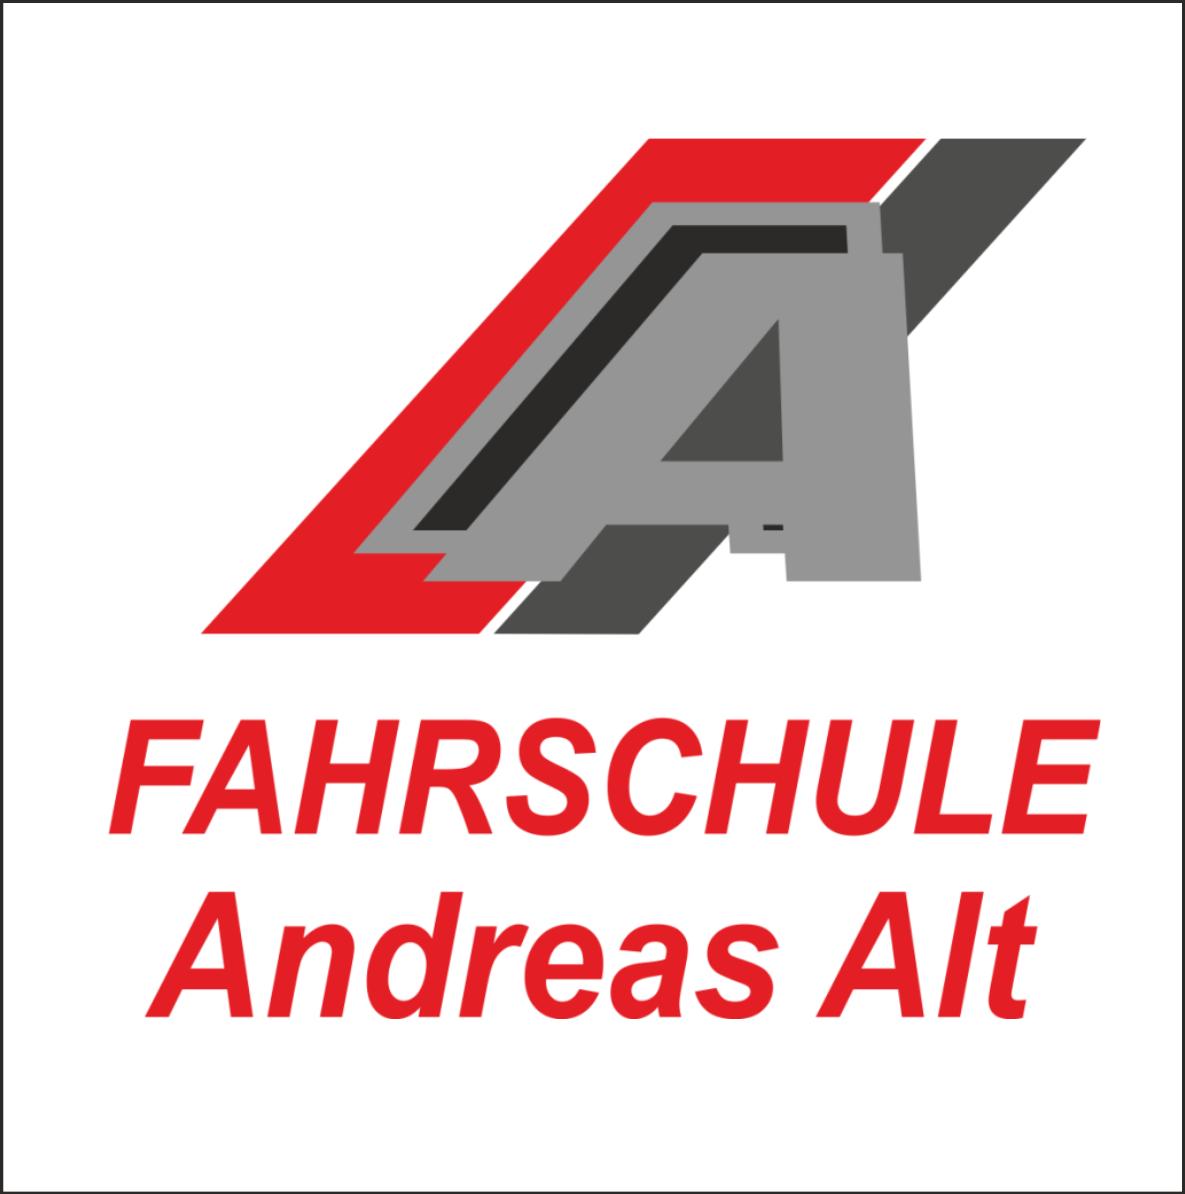 Fahrschule Andreas Alt